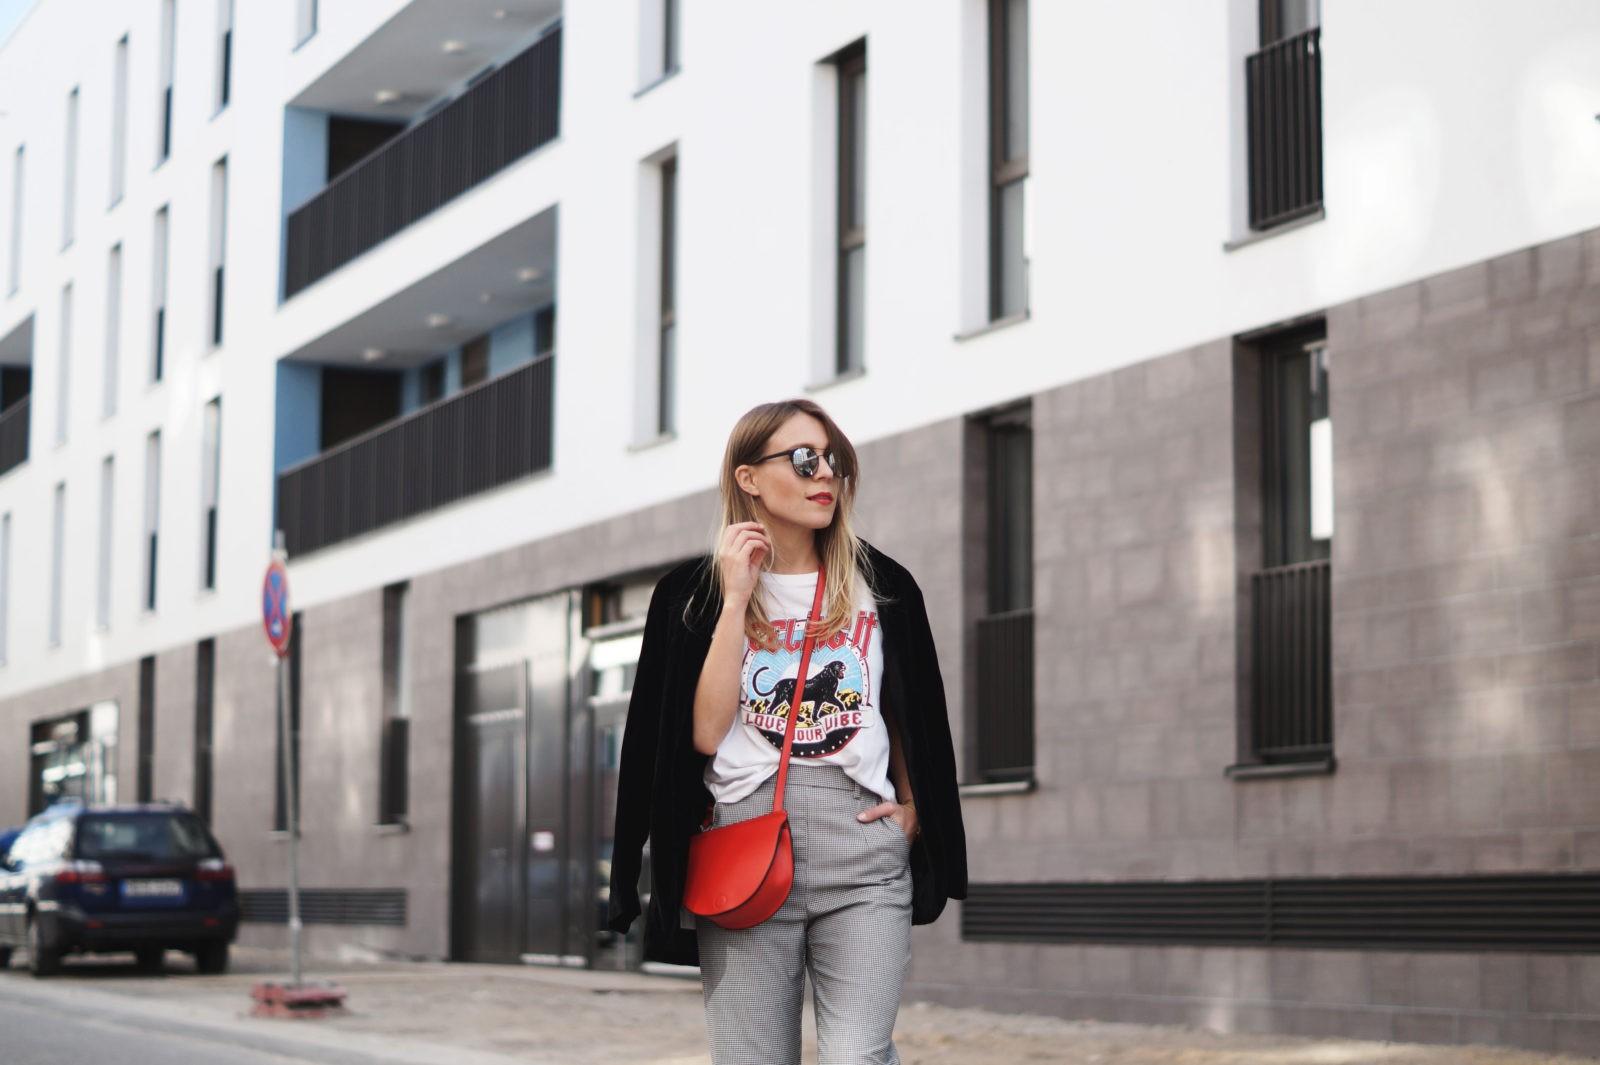 Slogan Shirt Pop of Red Outfit Fashionblogger Sariety Modeblog Heidelberg Bandshirt Karohose rote Tasche